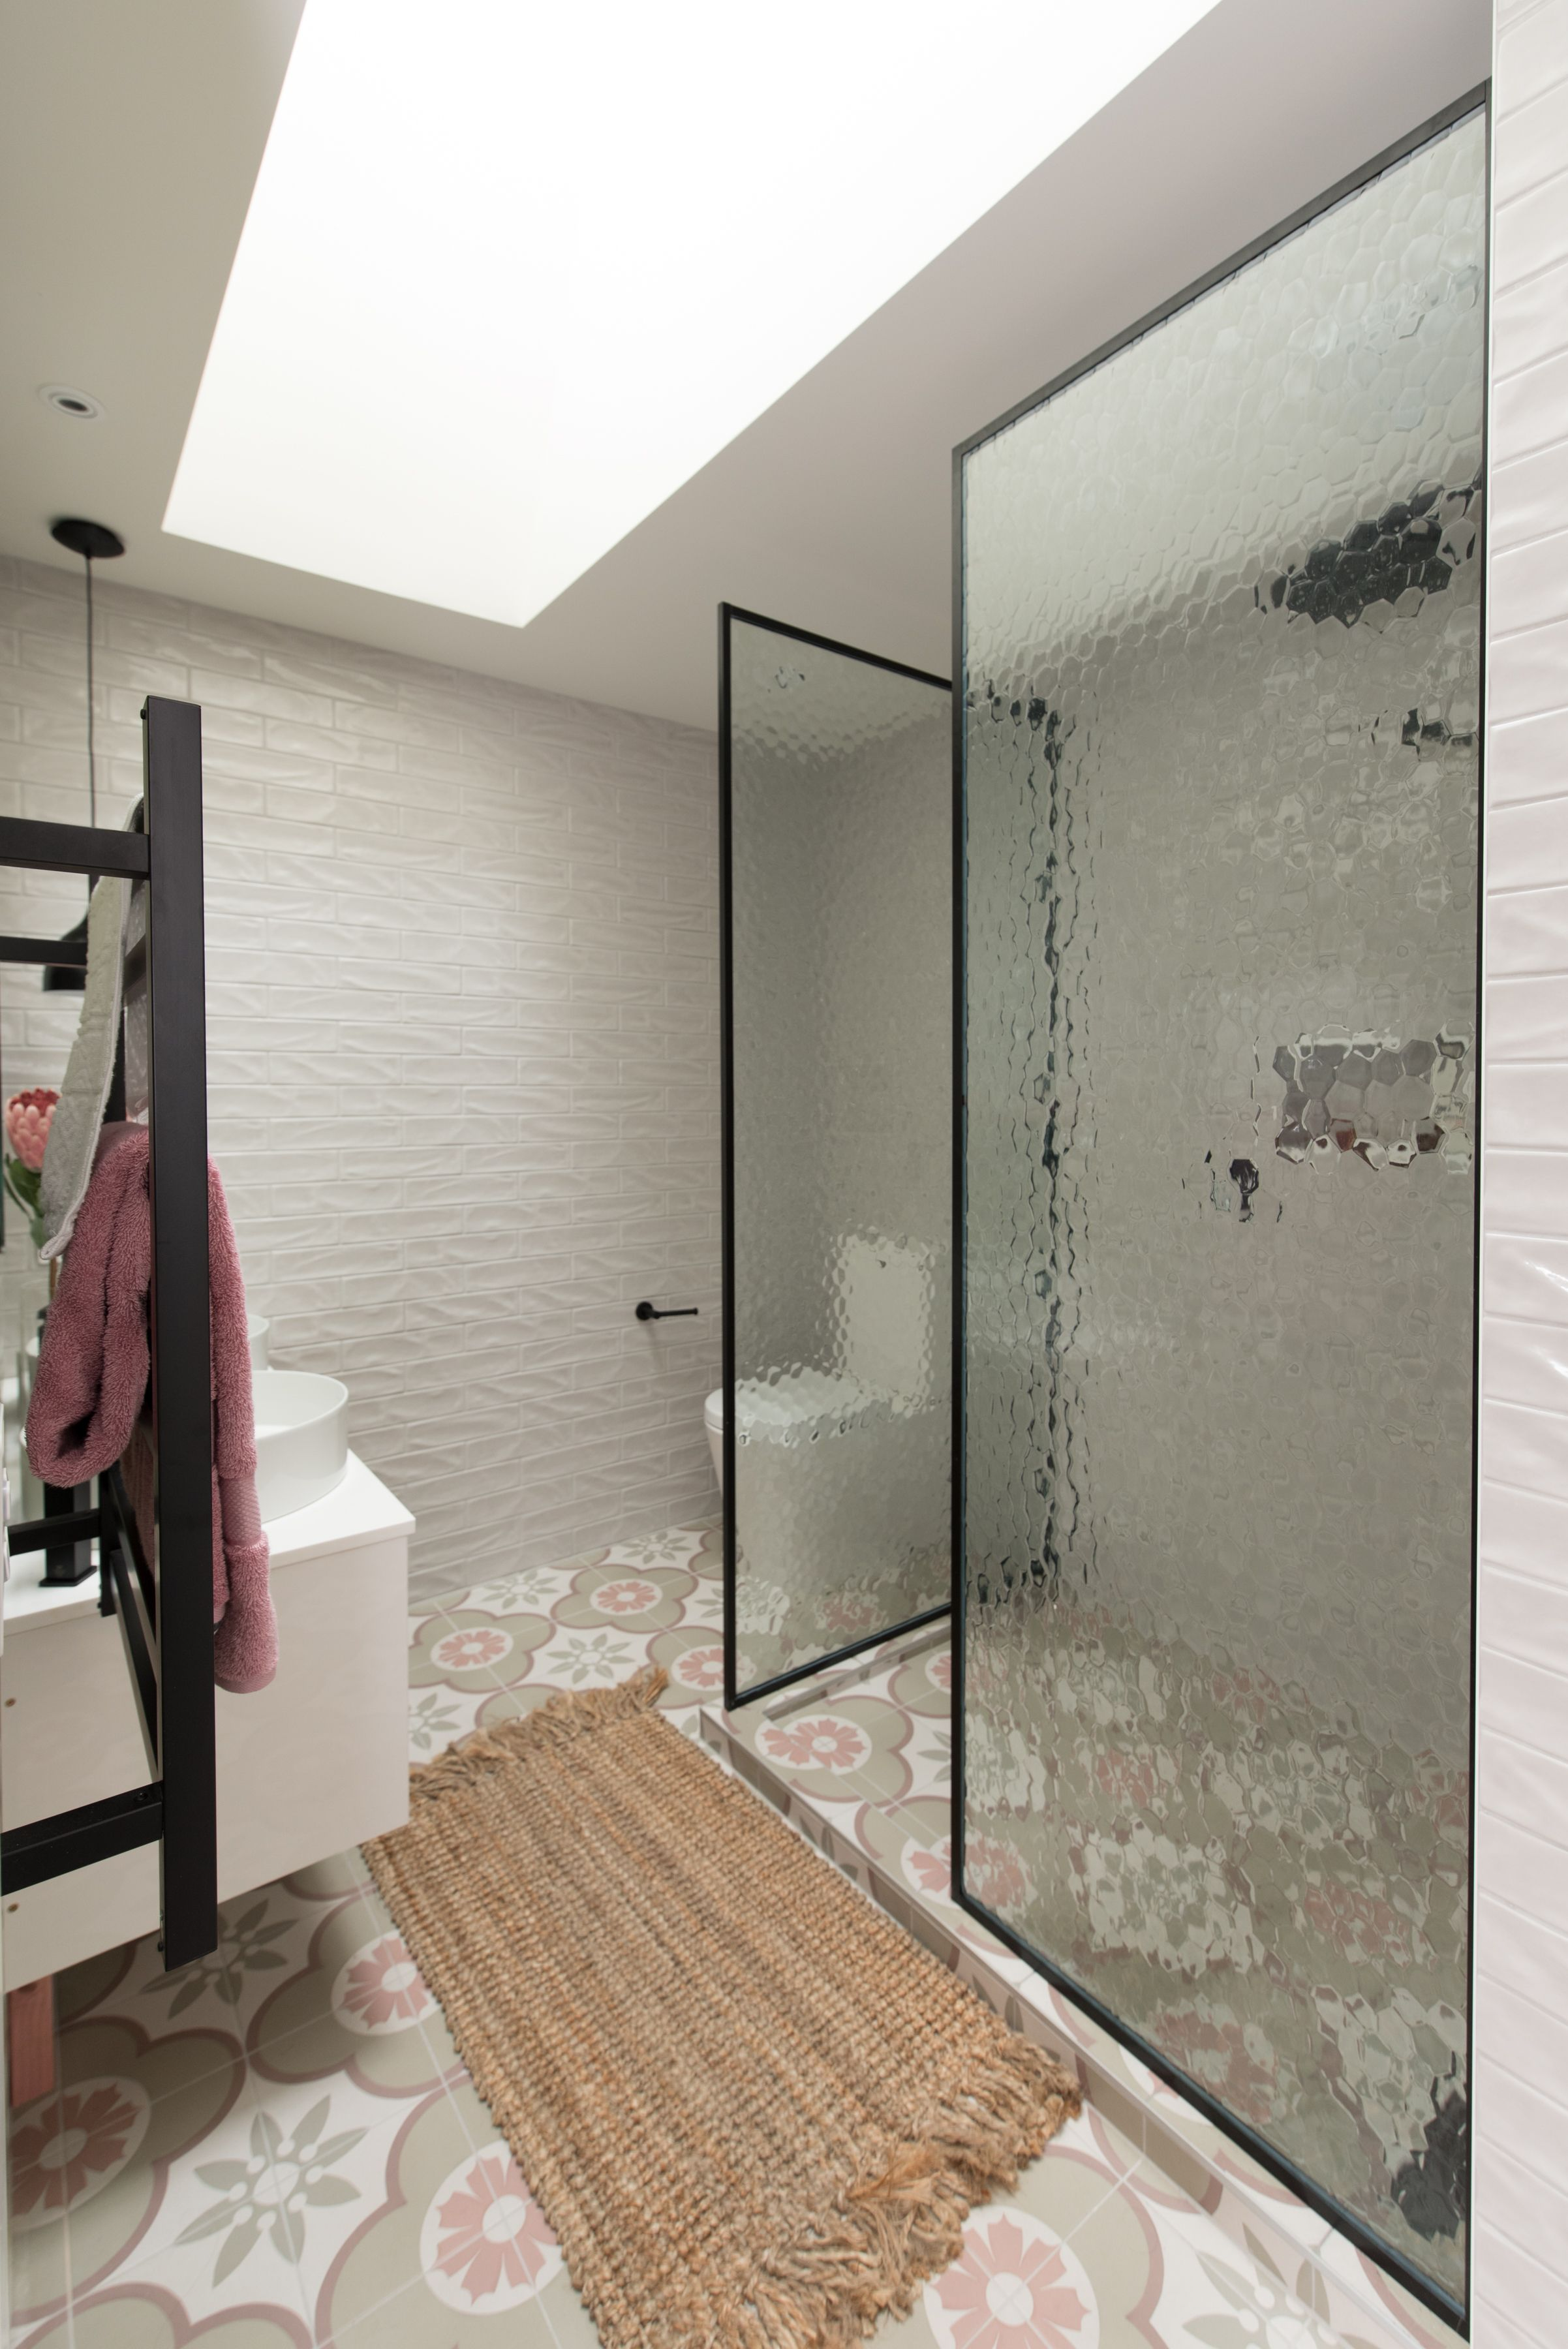 Top 10 Small Bathroom Design Ideas Small Bathroom Design